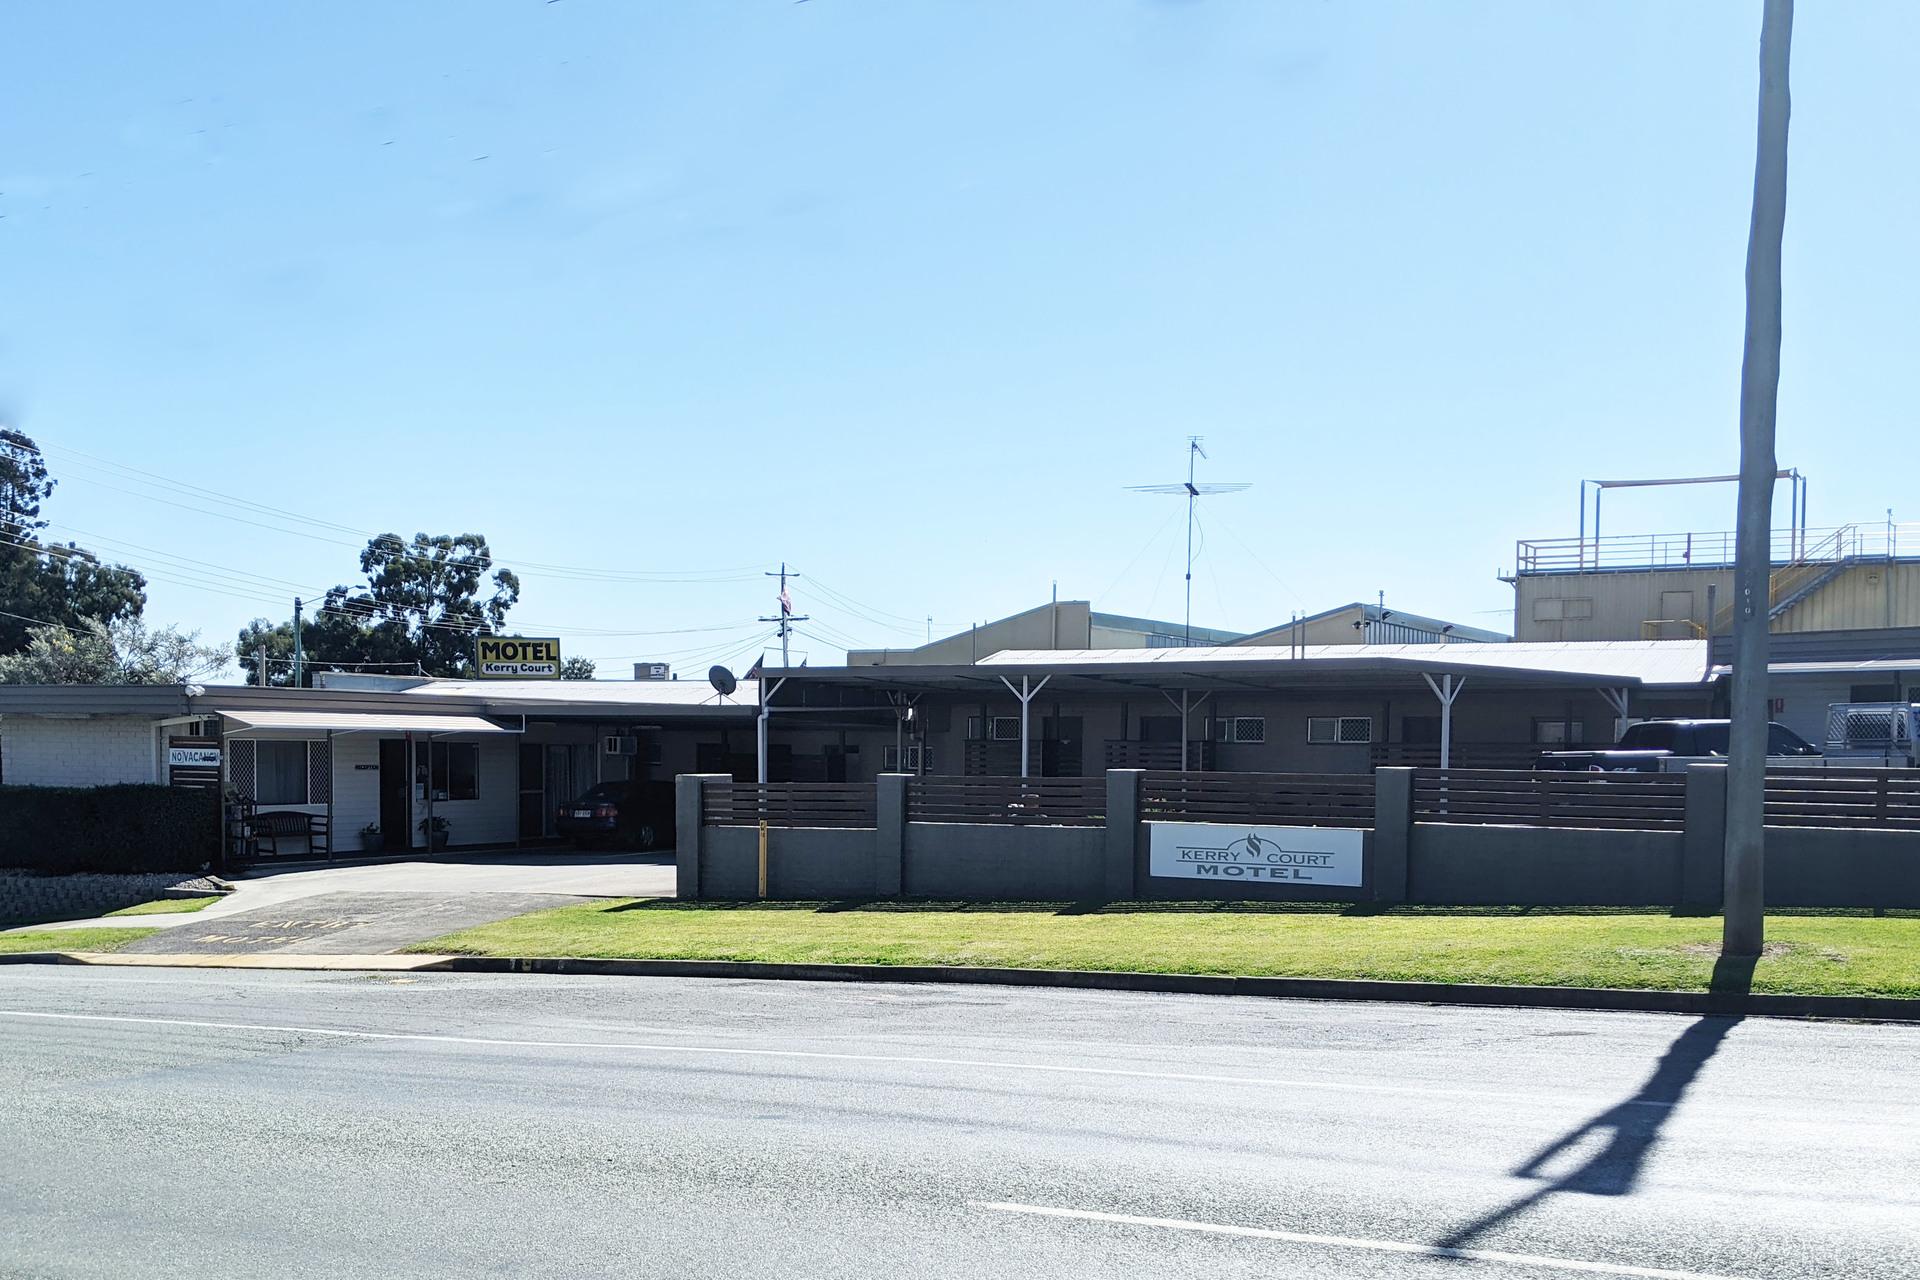 c - Kerry Court Motel